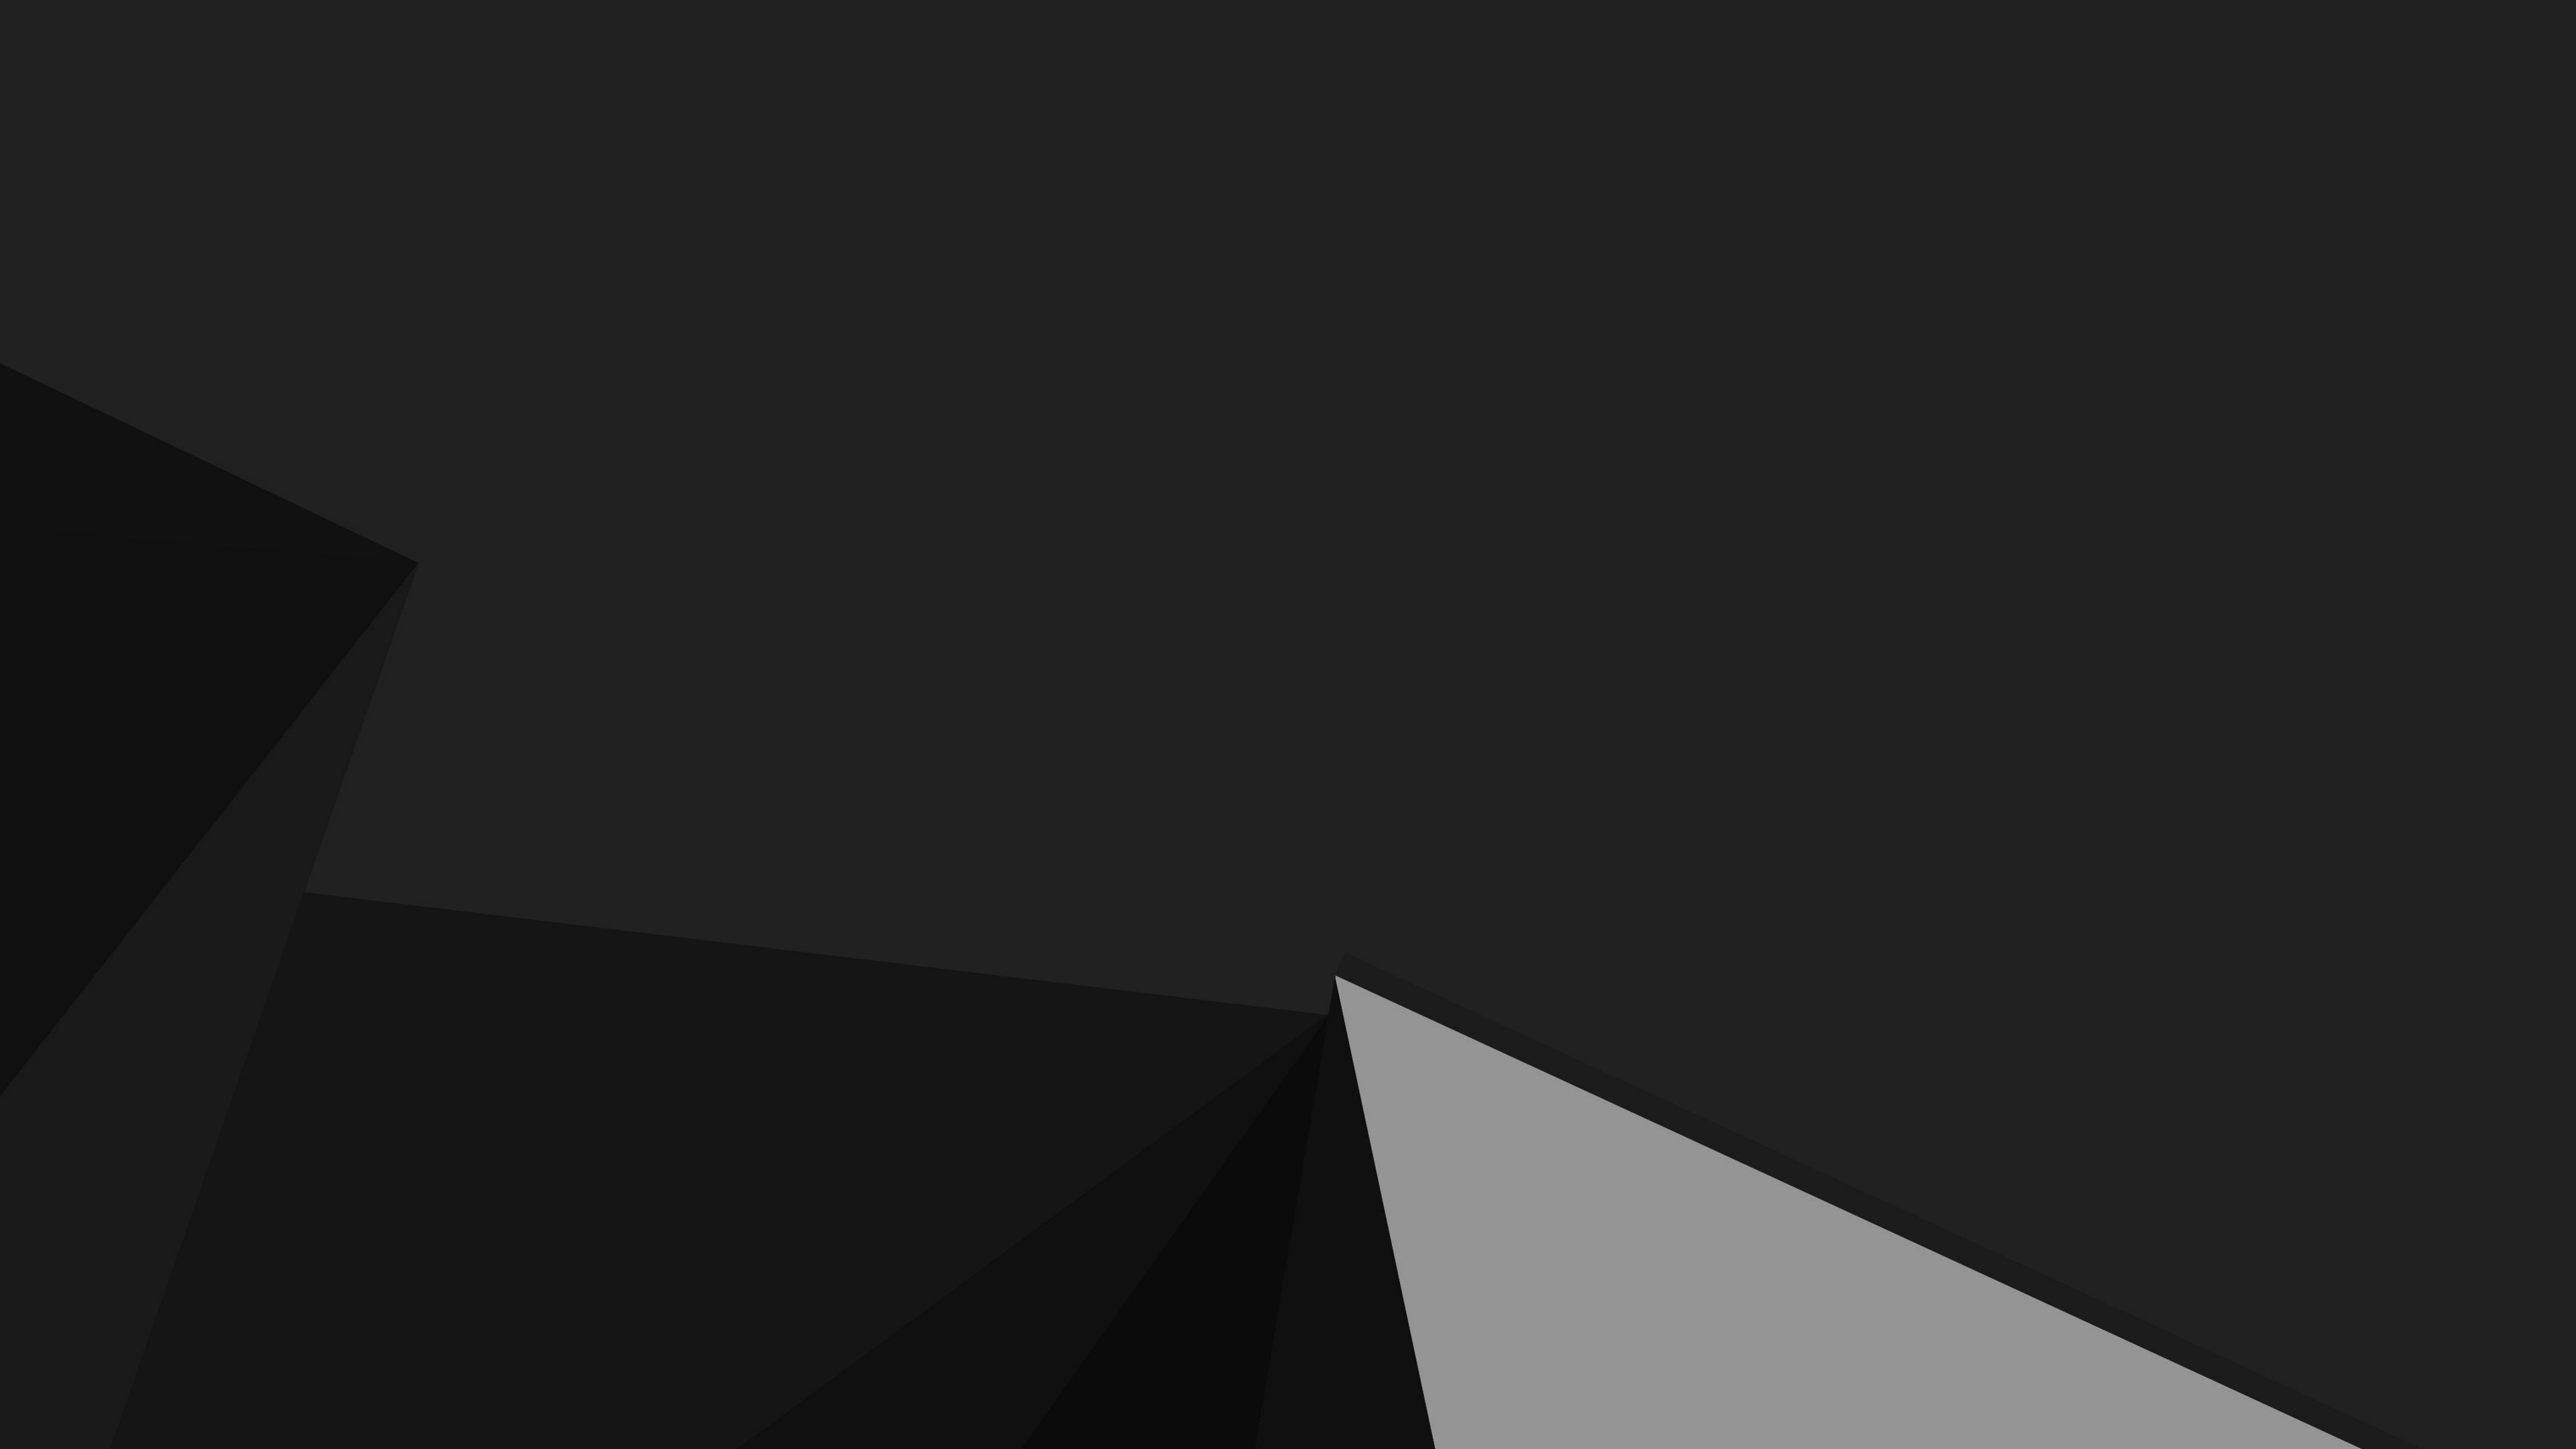 Windows 10 Minimal Wallpaper - WallpaperSafari